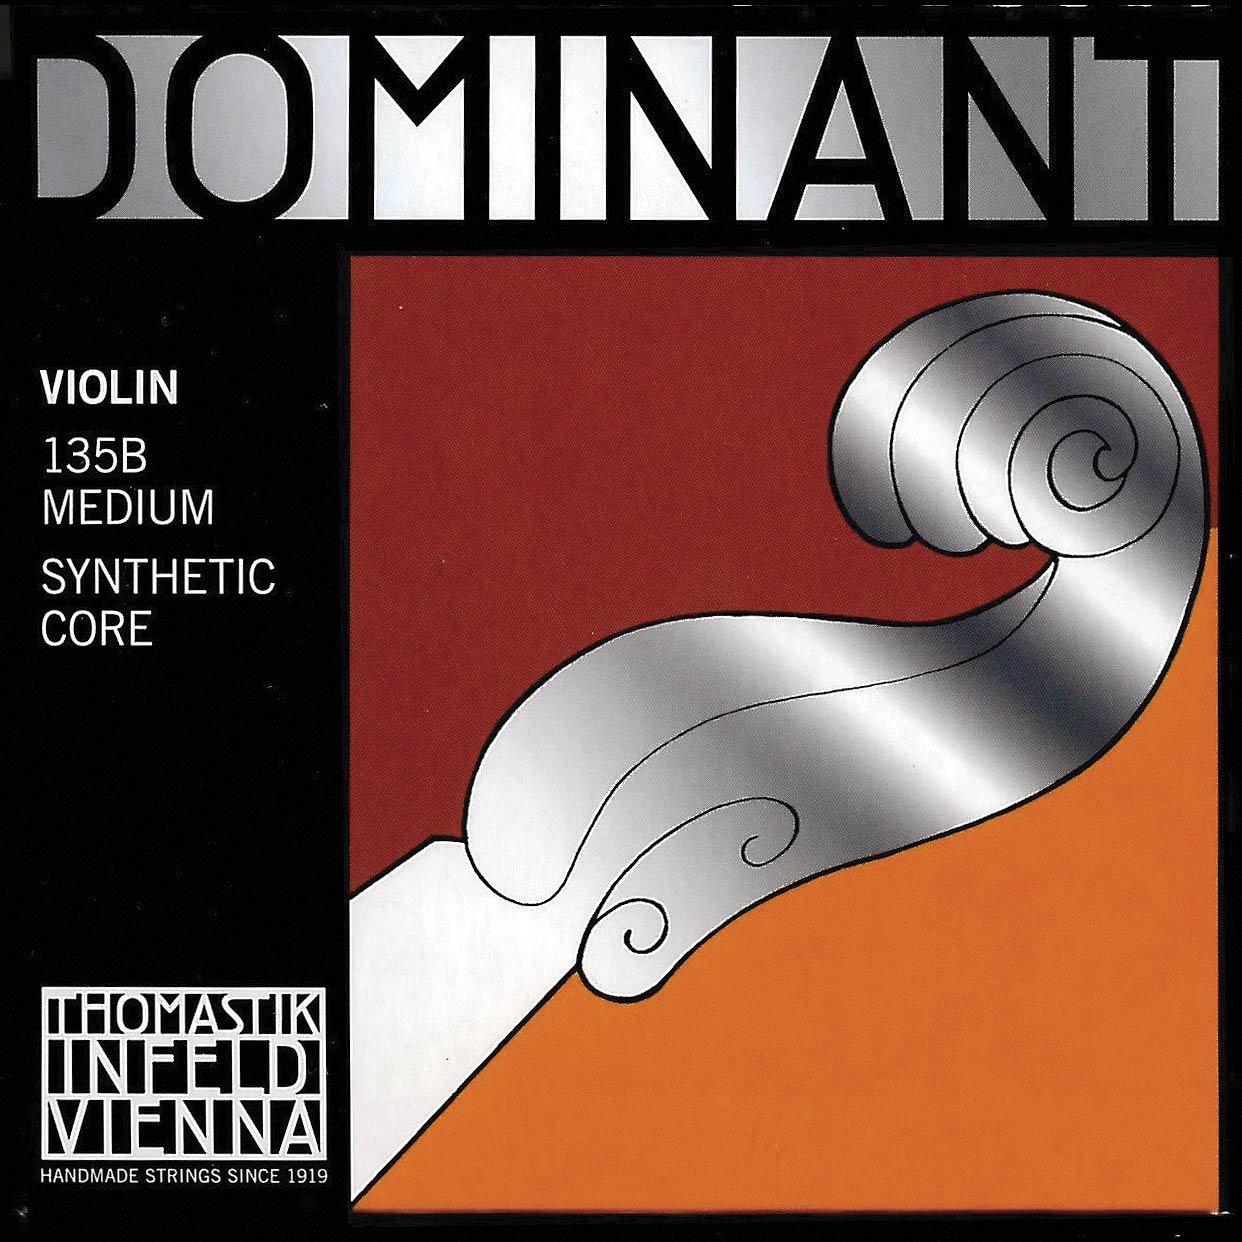 Thomastik Dominant 4/4 Violin String Set - Medium Gauge - Steel Ball-End E Tho-5505